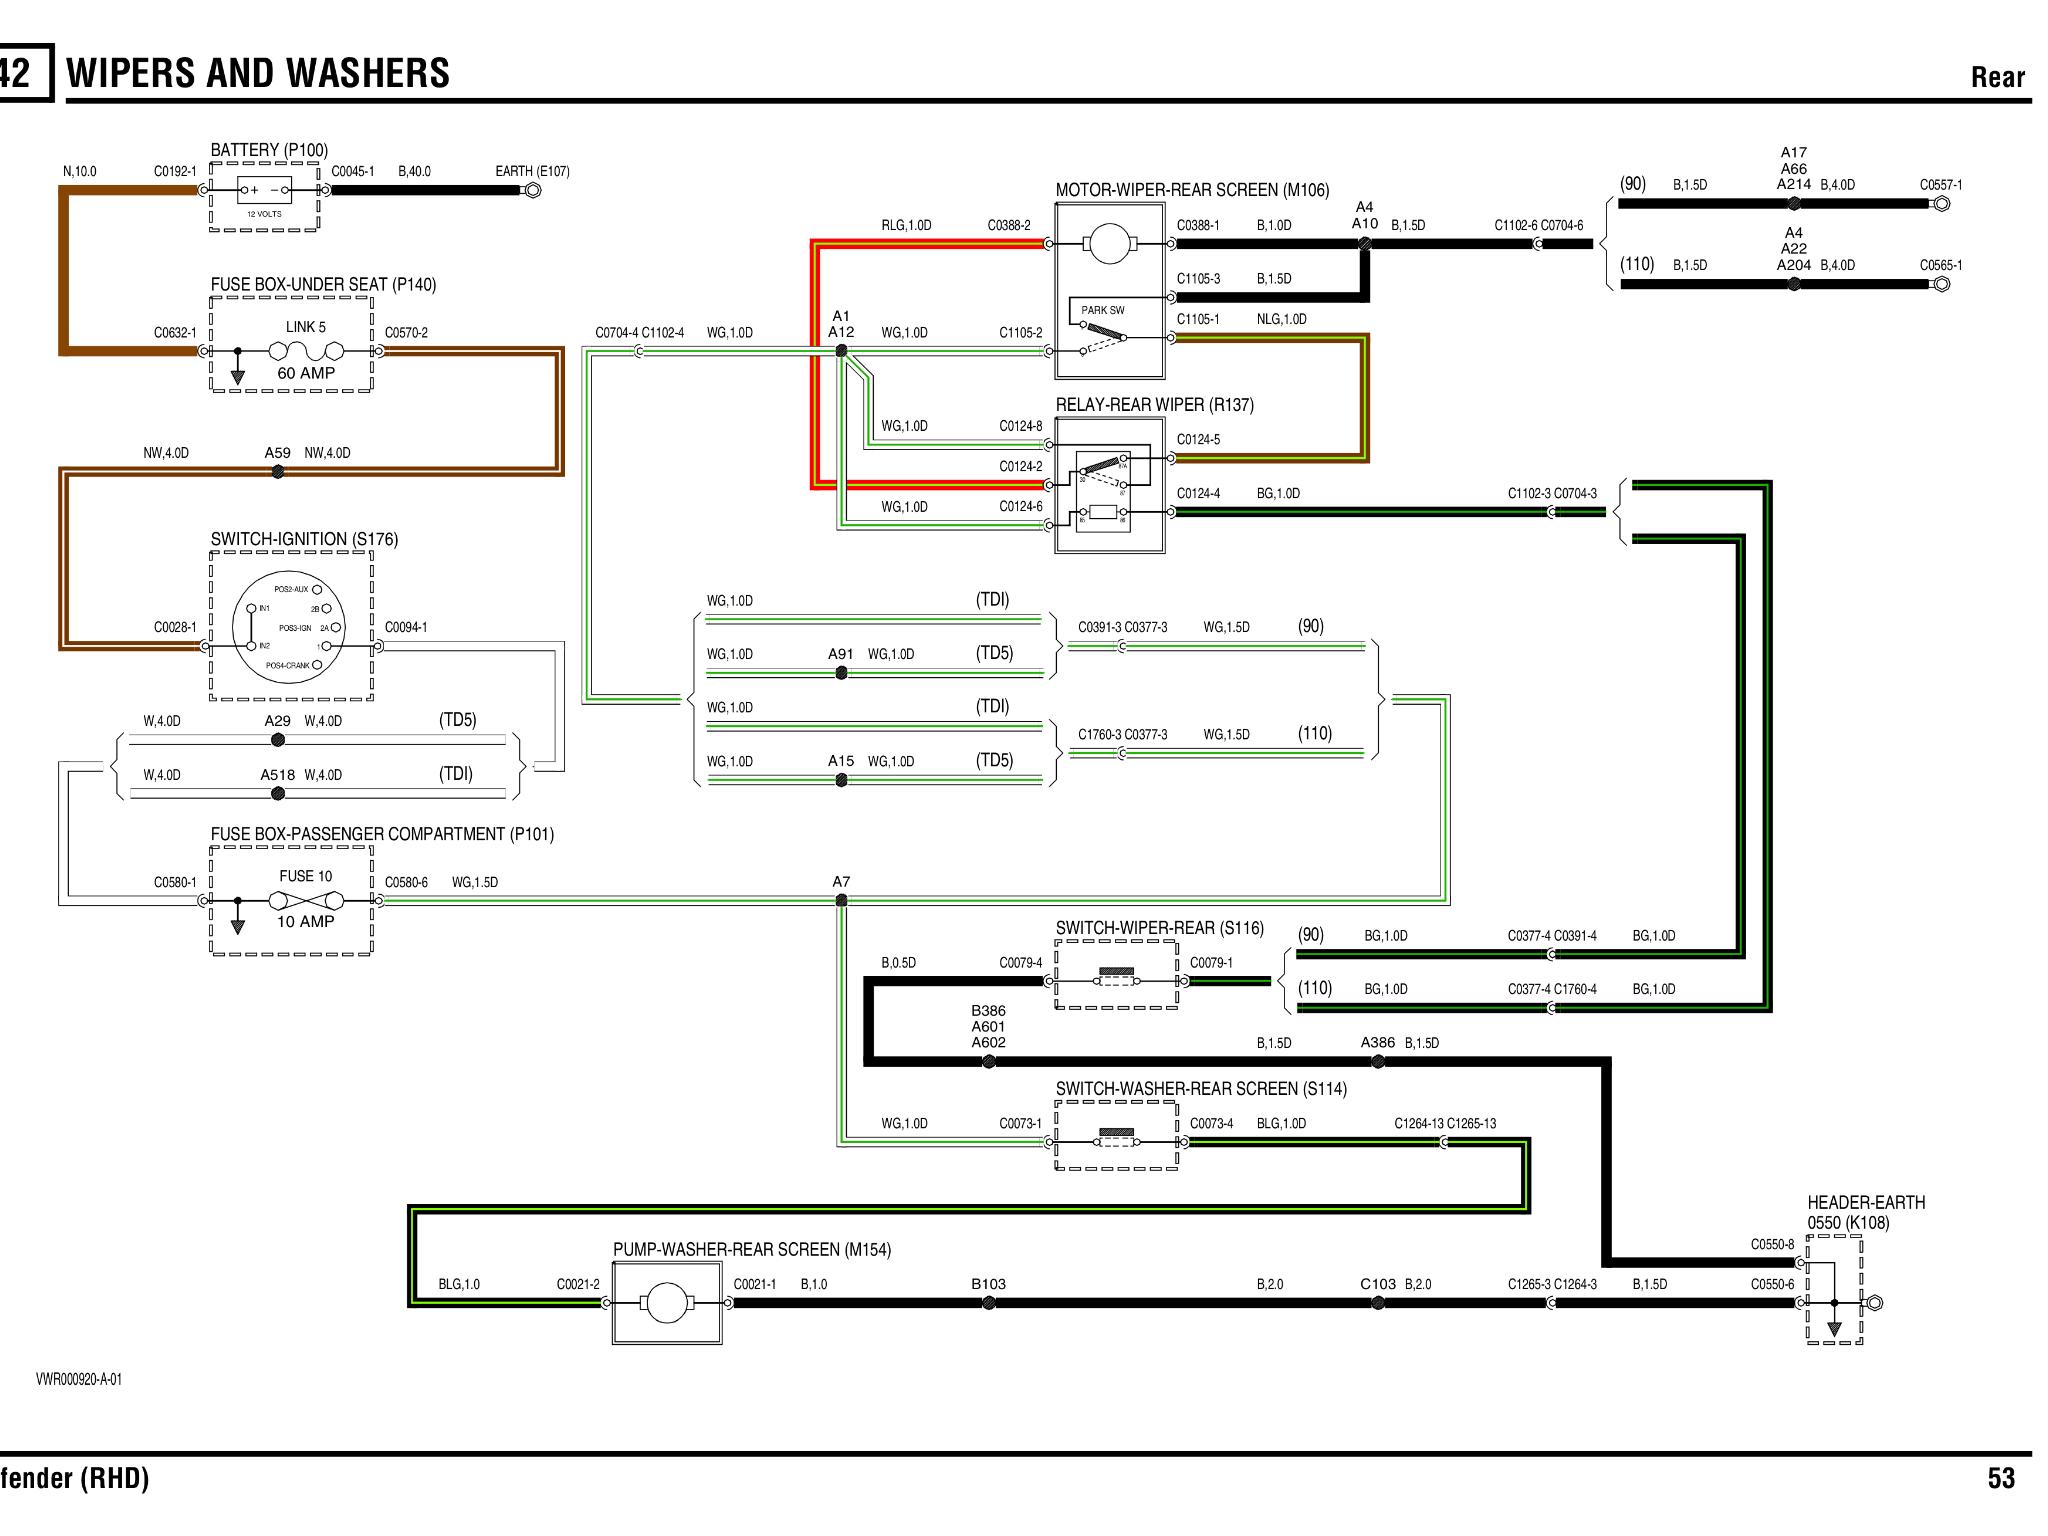 rear wiper motor wiring diagram 3 way dimmer switch multiple lights td5 help please defender forum lr4x4 the